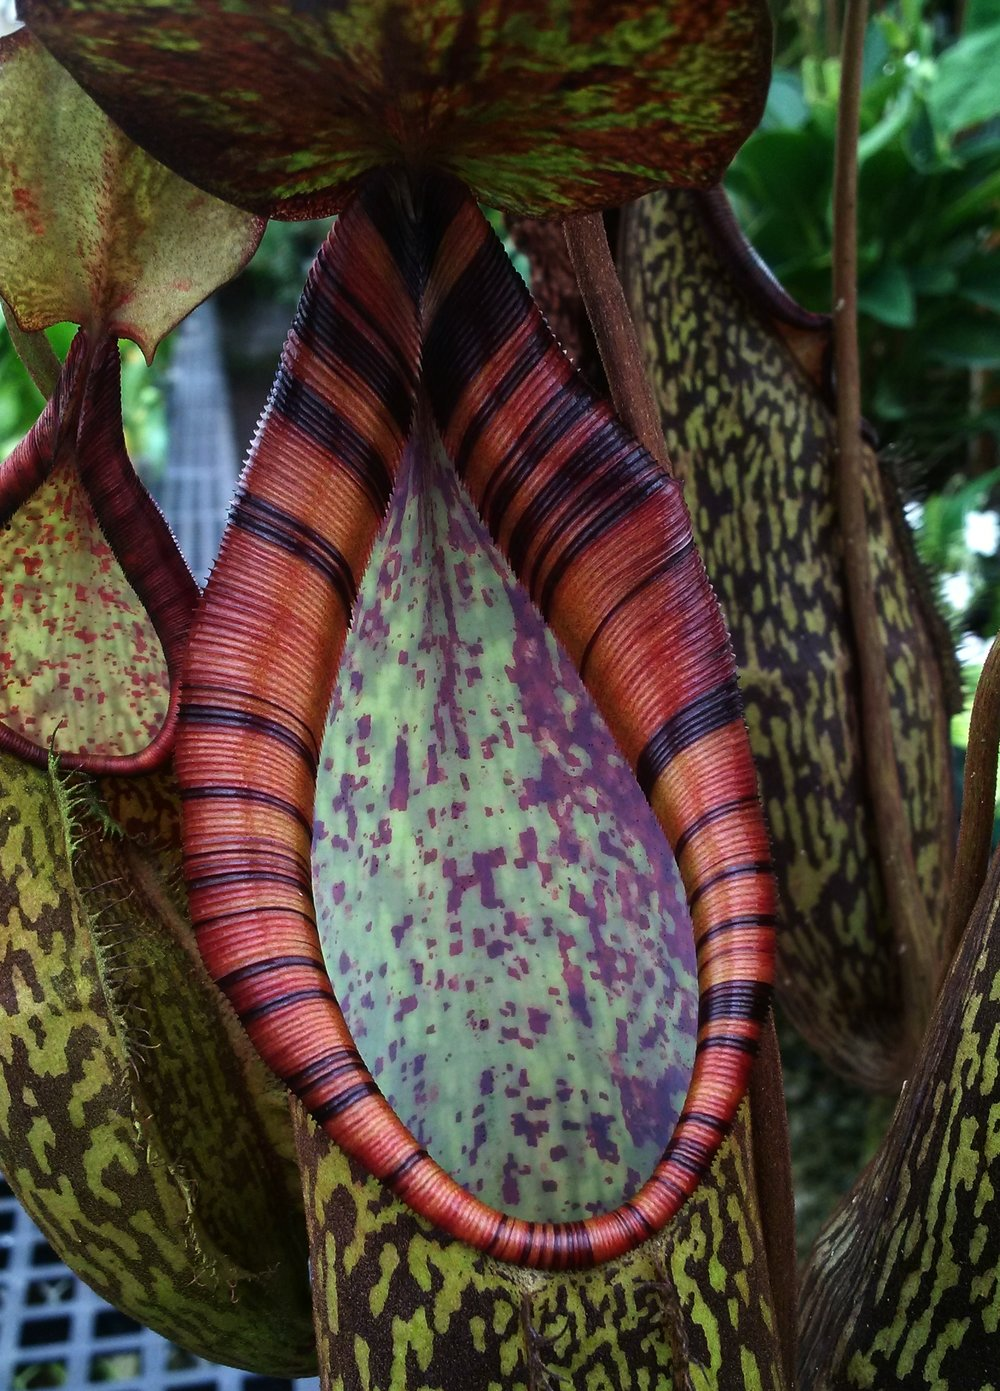 Peristome detail of the endangered natural hybrid Sumatran pitcher plant,  Nepenthes rigidifolia x spectabilis